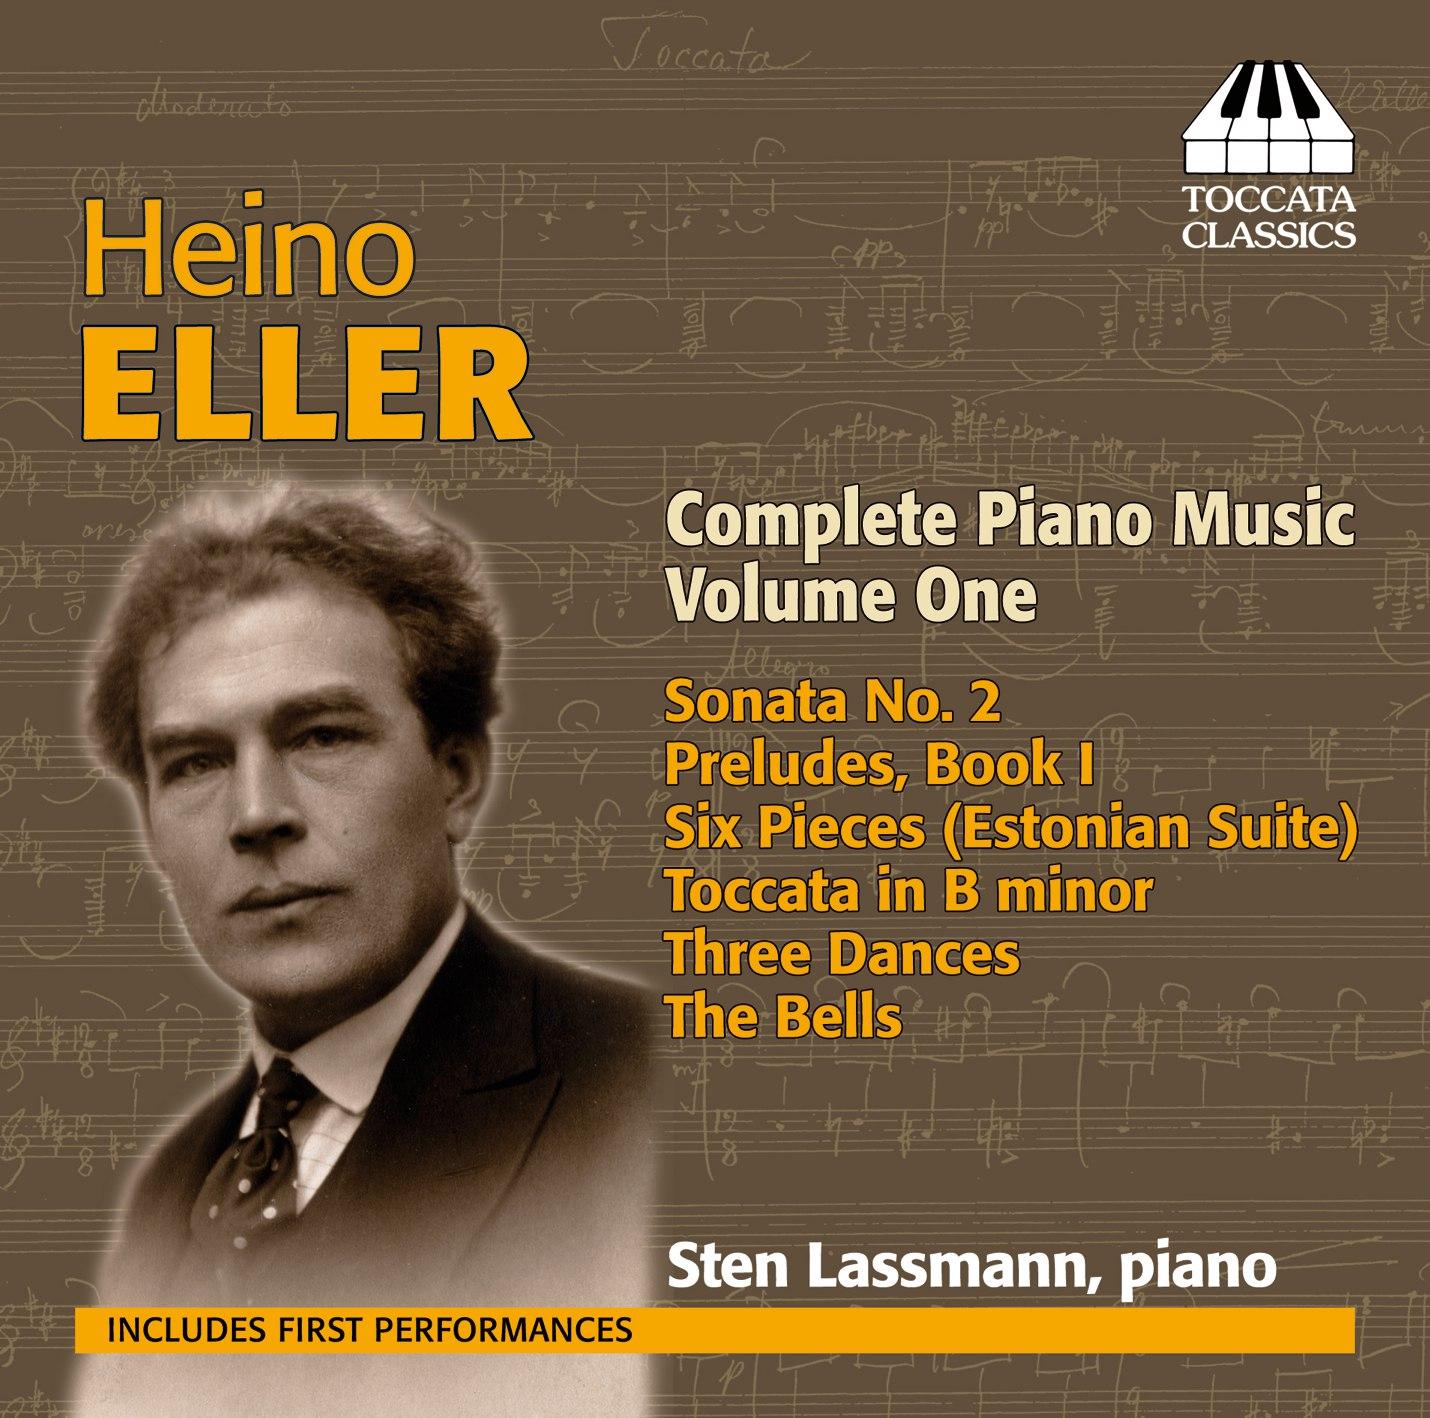 Heino Eller: Complete Piano Music